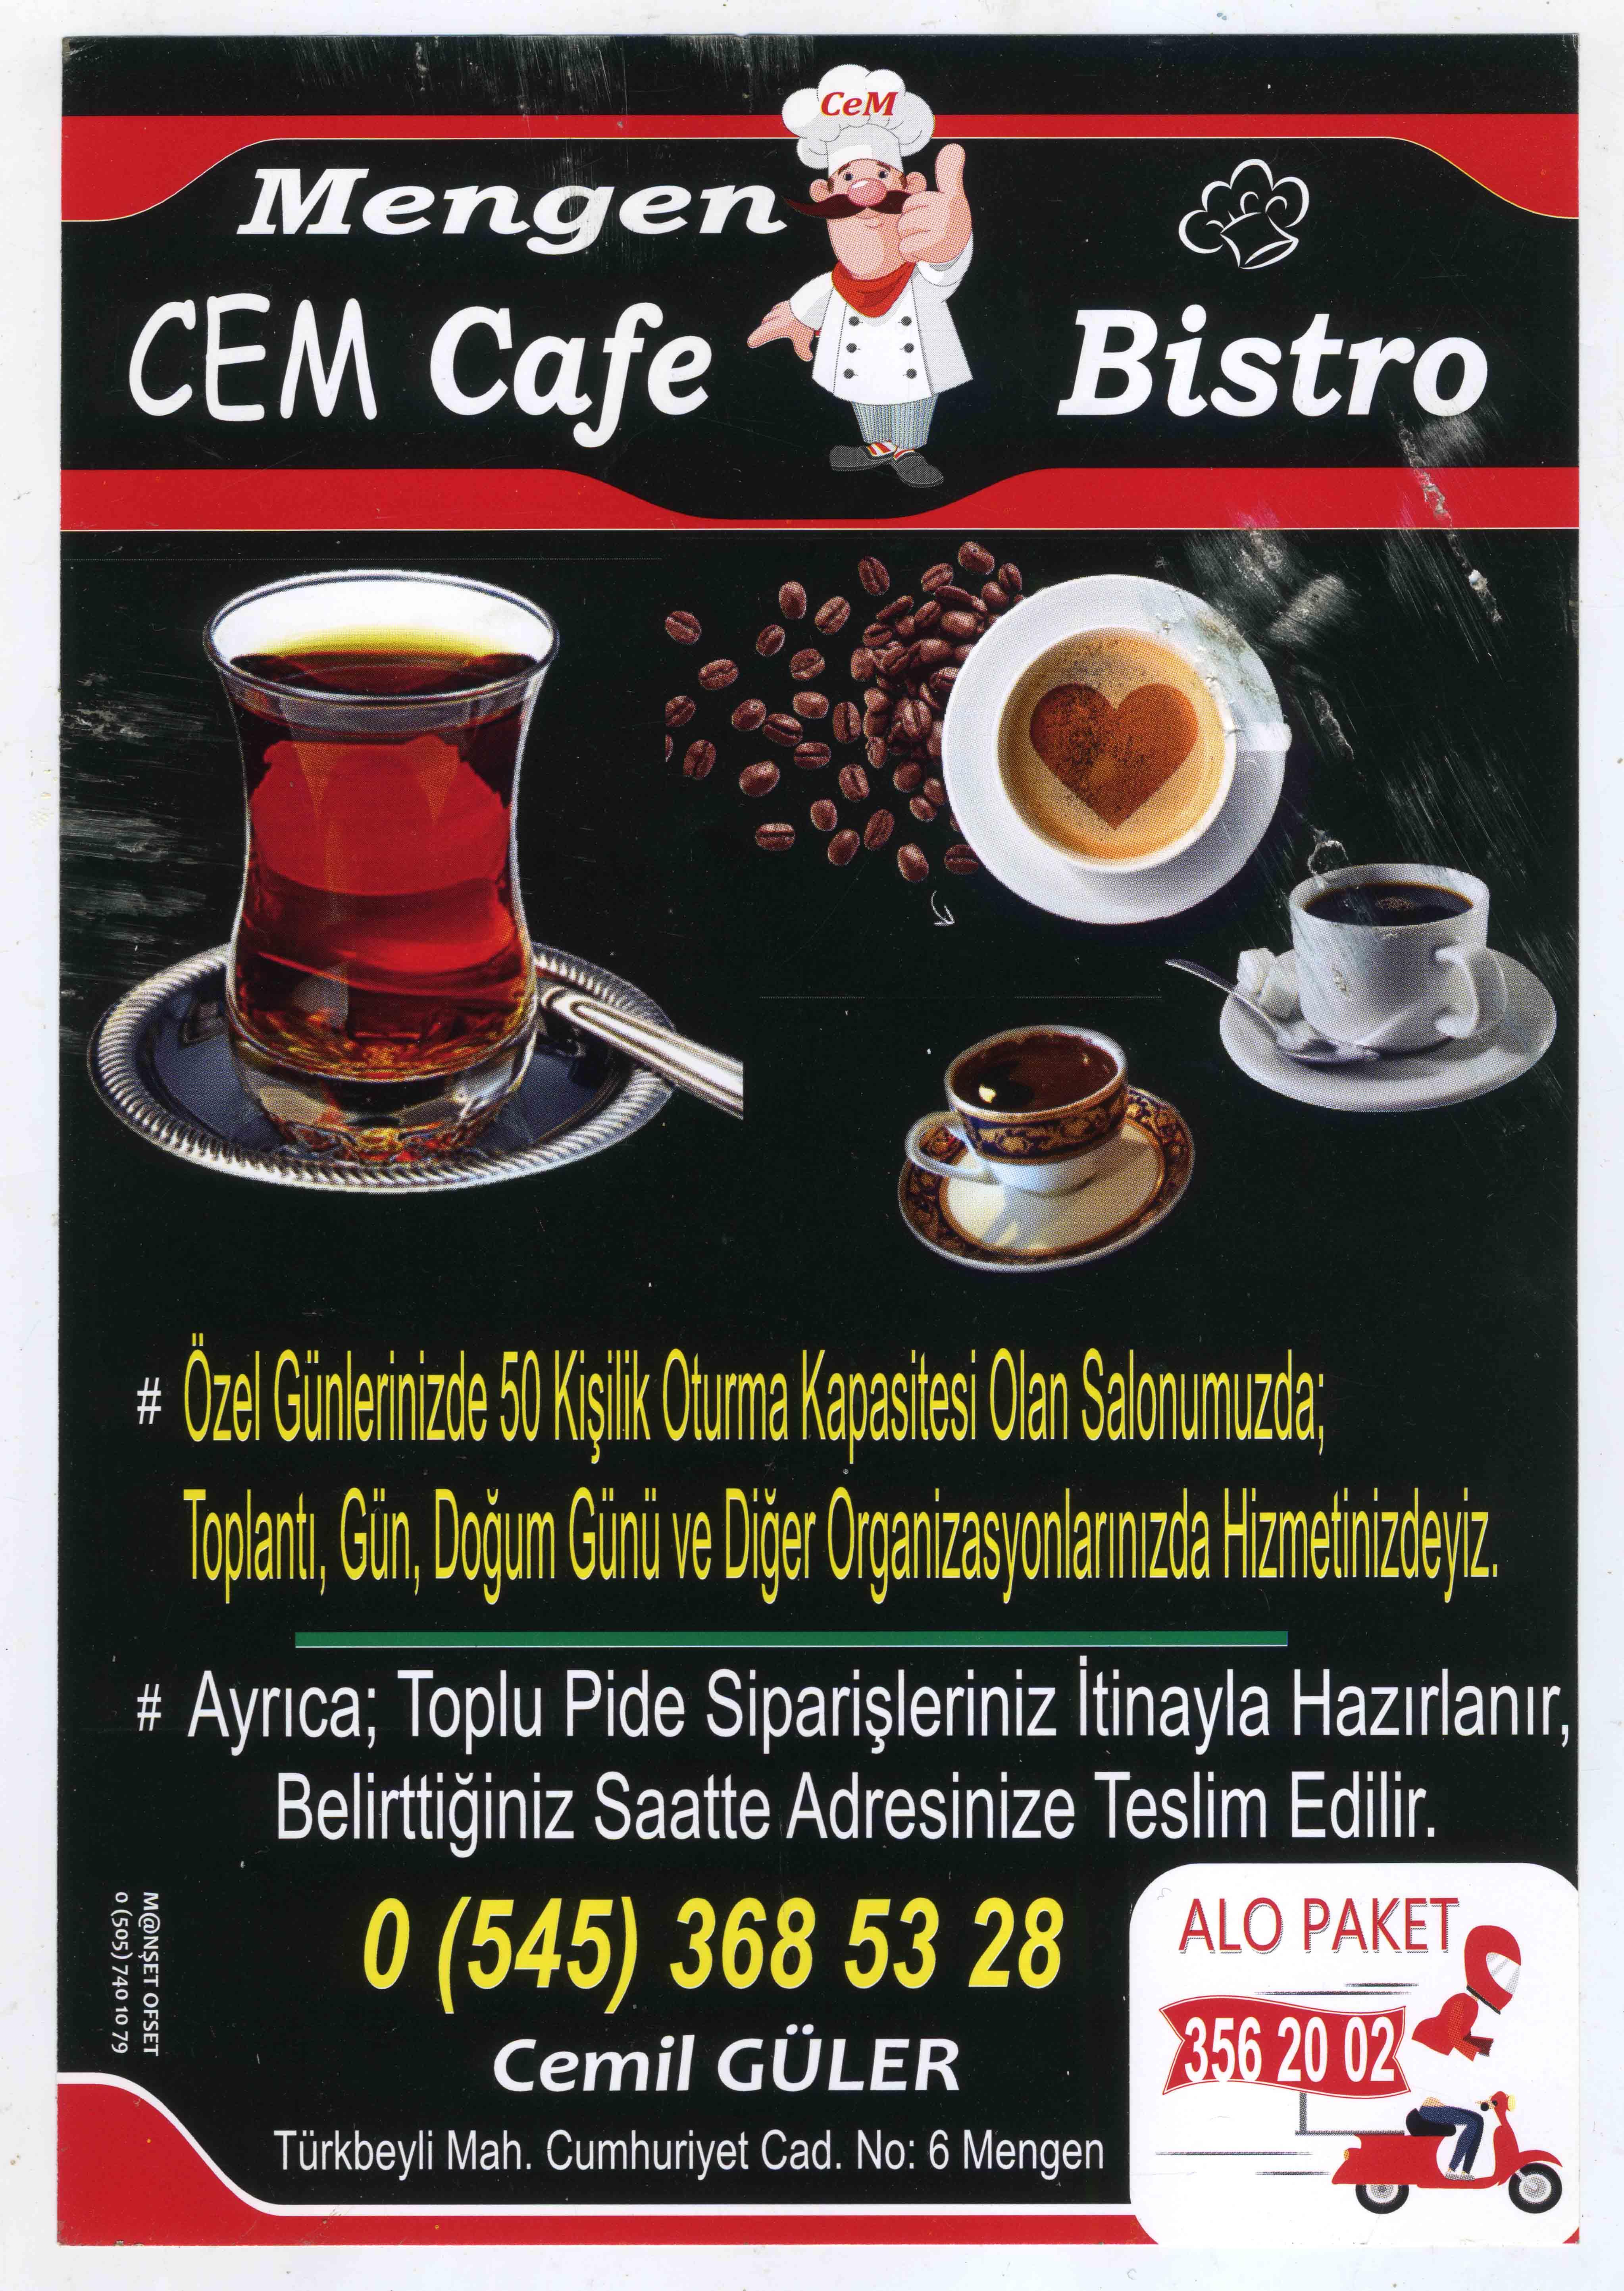 Reklam:Mengen CEM Cafe Bistro'dan hesaplı Tabldot